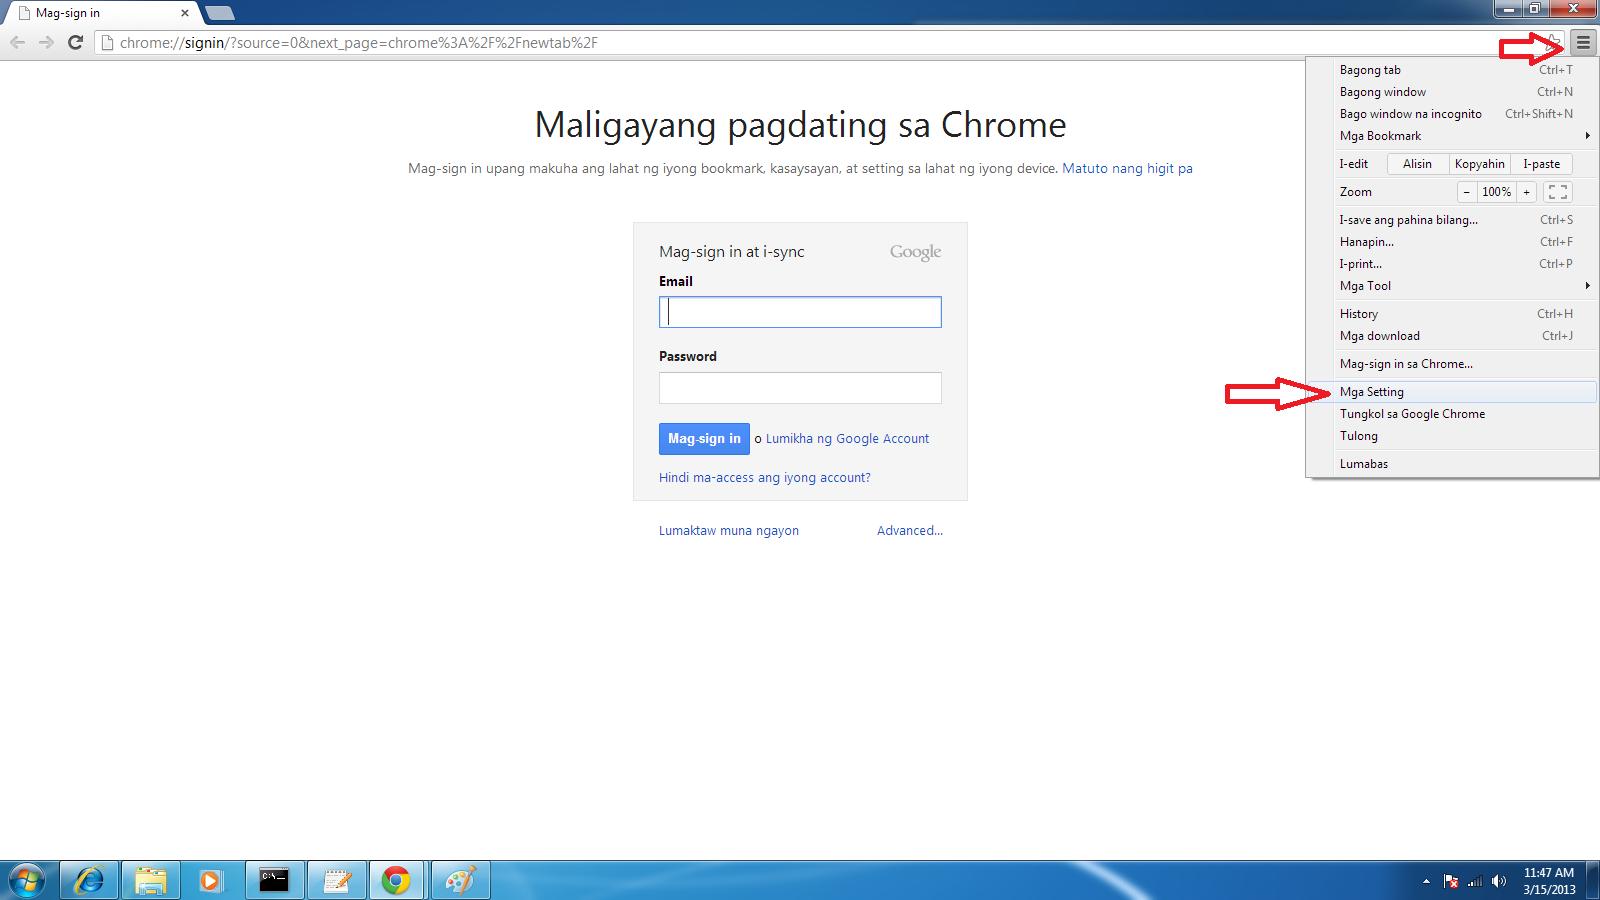 foobaring: HowTo:Google Chrome from Tagalog to English